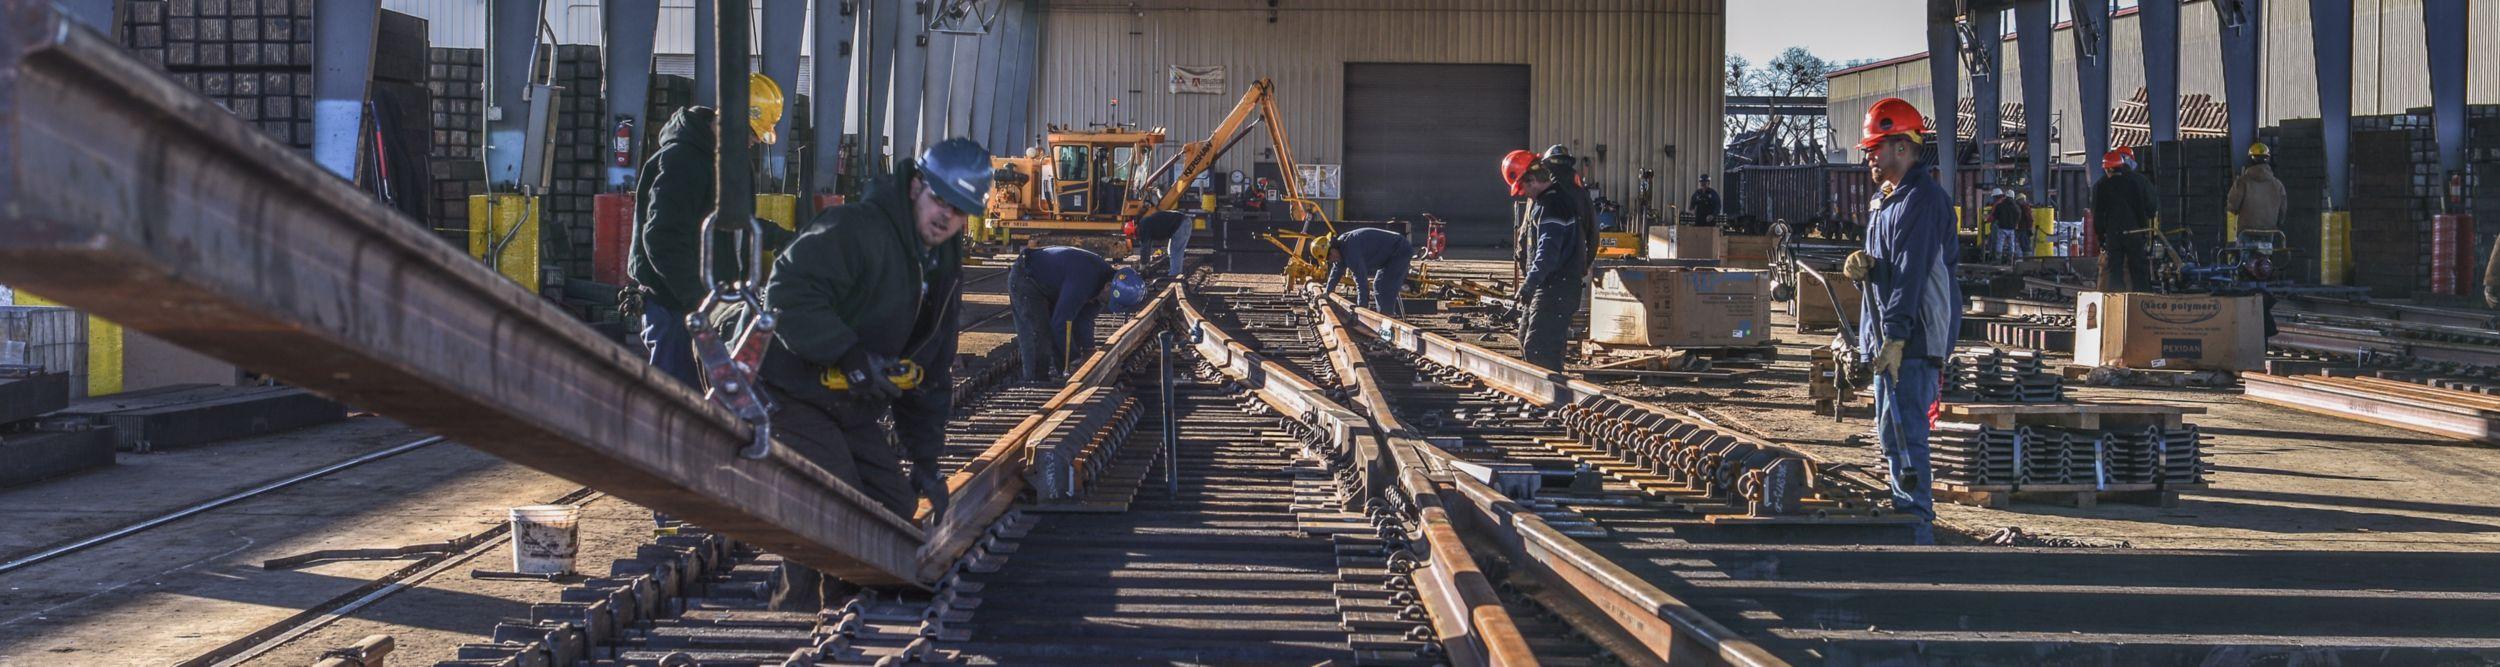 Progress Rail | Rail Services